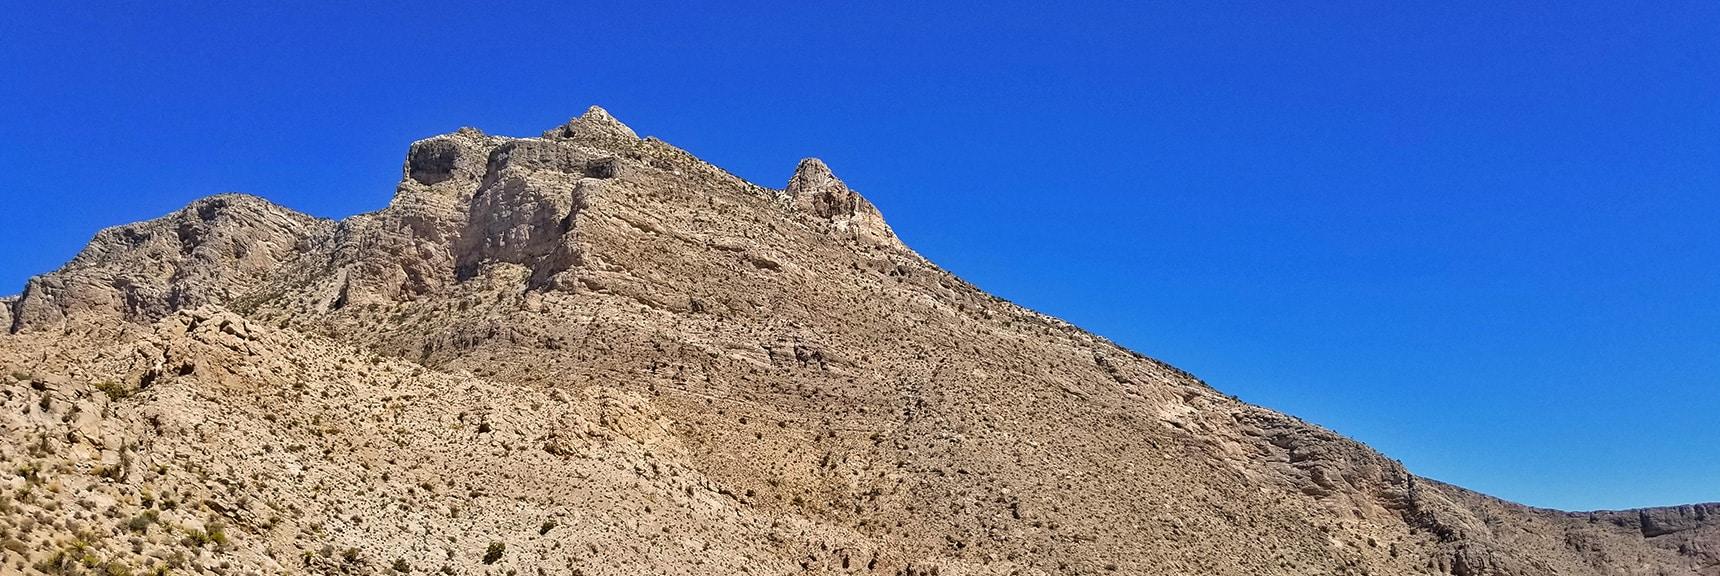 South side of Damsel Peak from an Adjoining Ridge | Damsel Peak Southern Approach | Calico Basin, Nevada